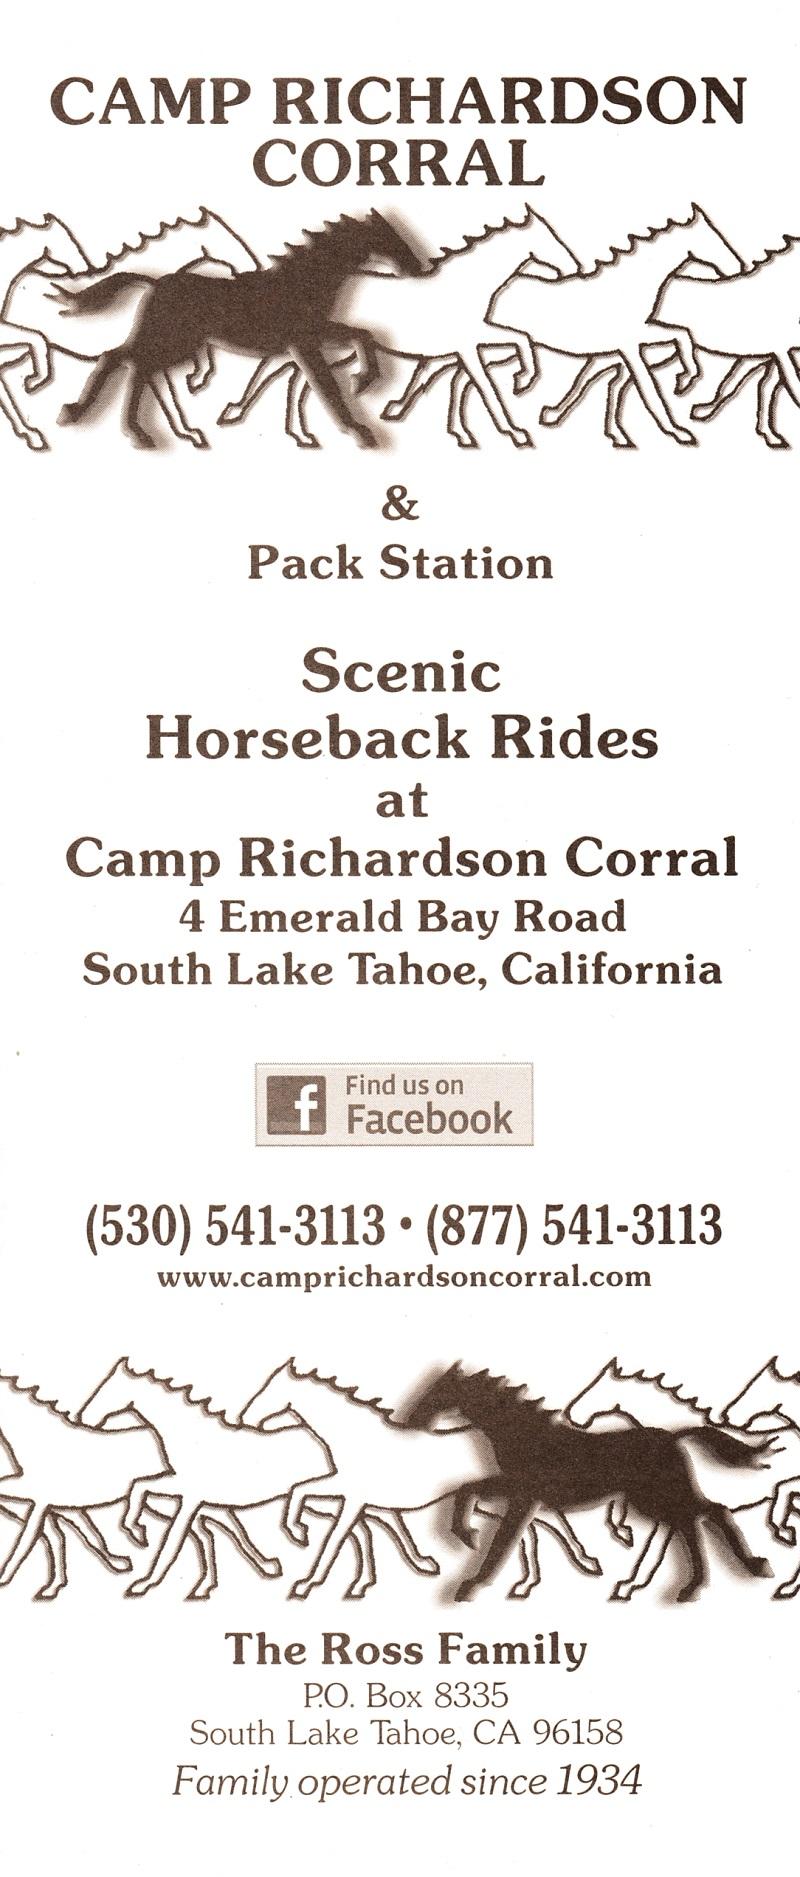 Camp Richardson Corral